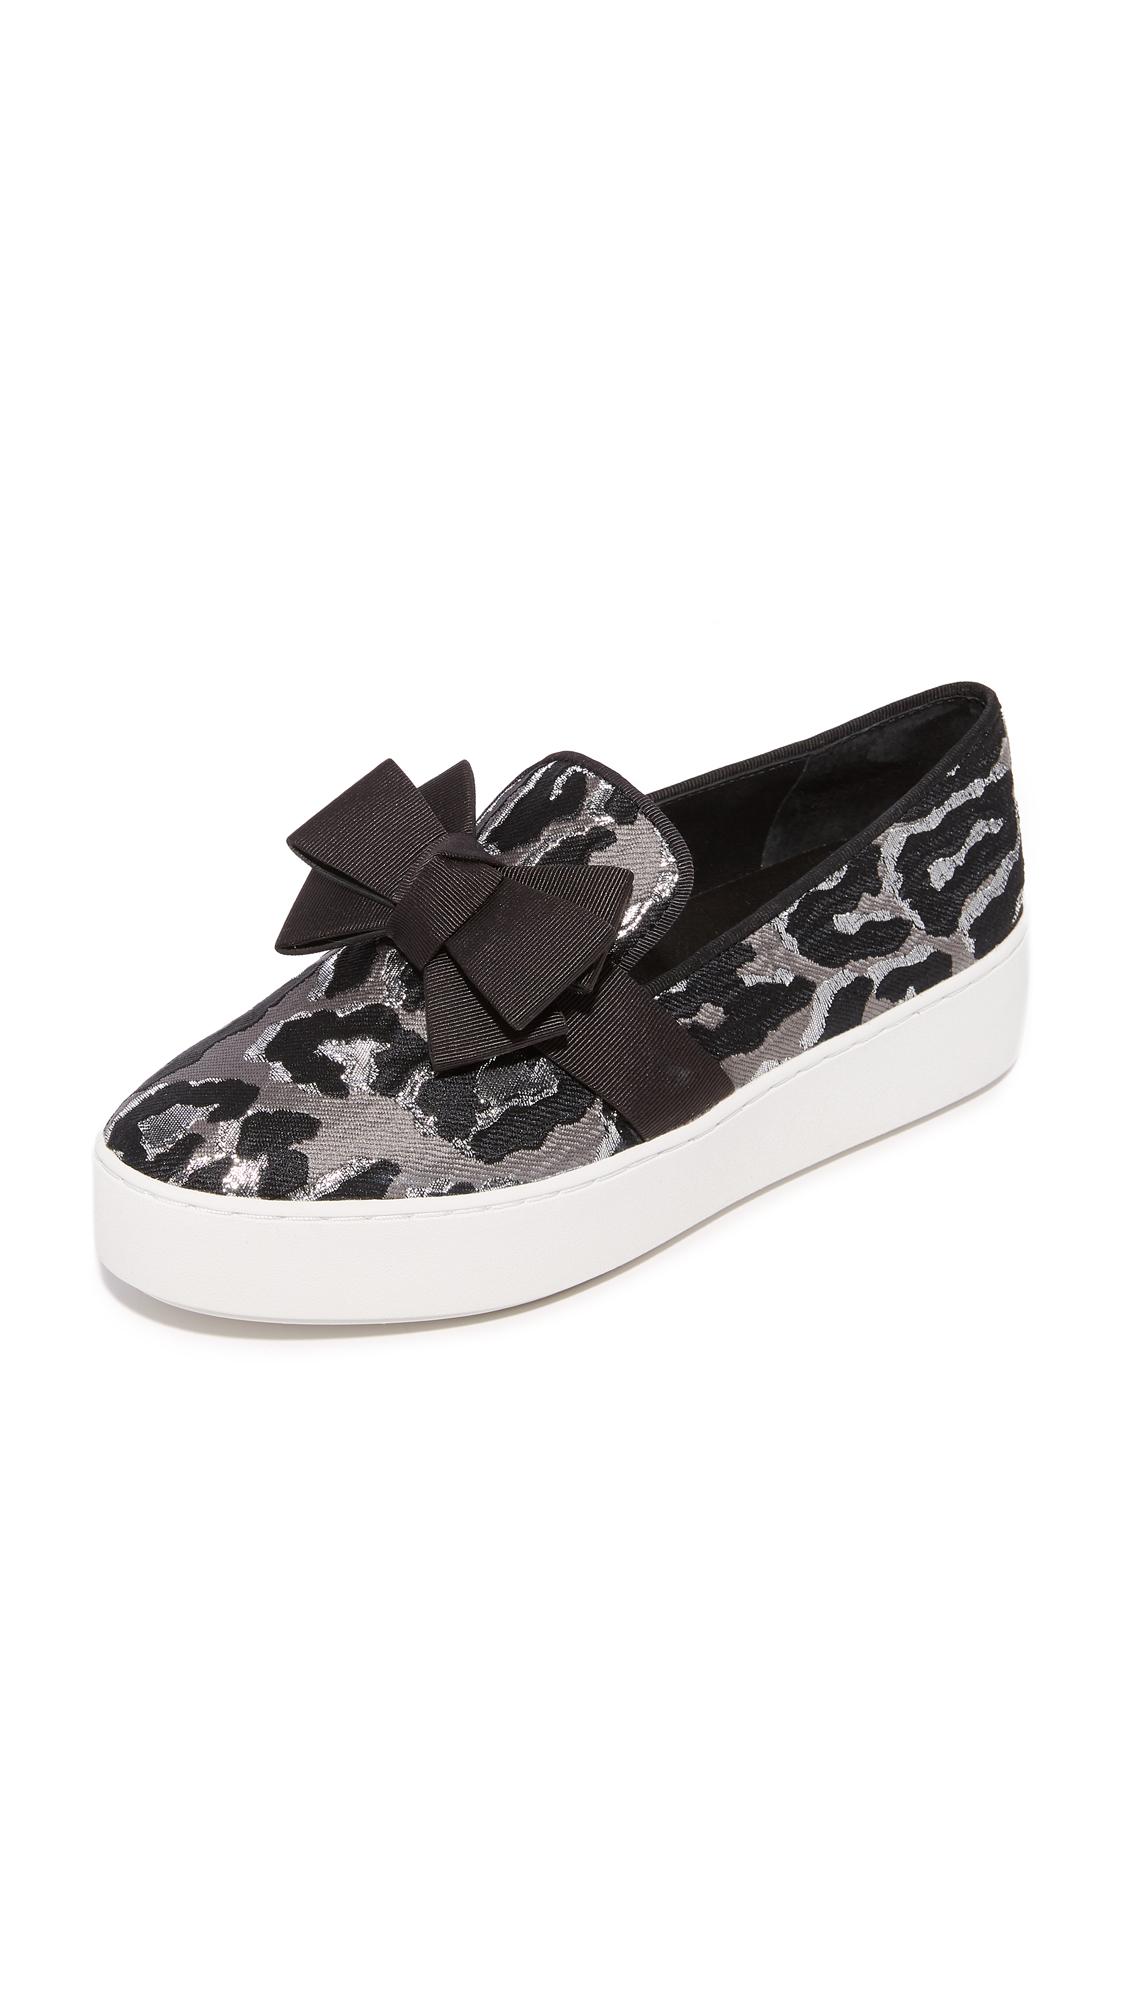 Michael Kors Collection Val Platform Slip On Sneakers - Slate